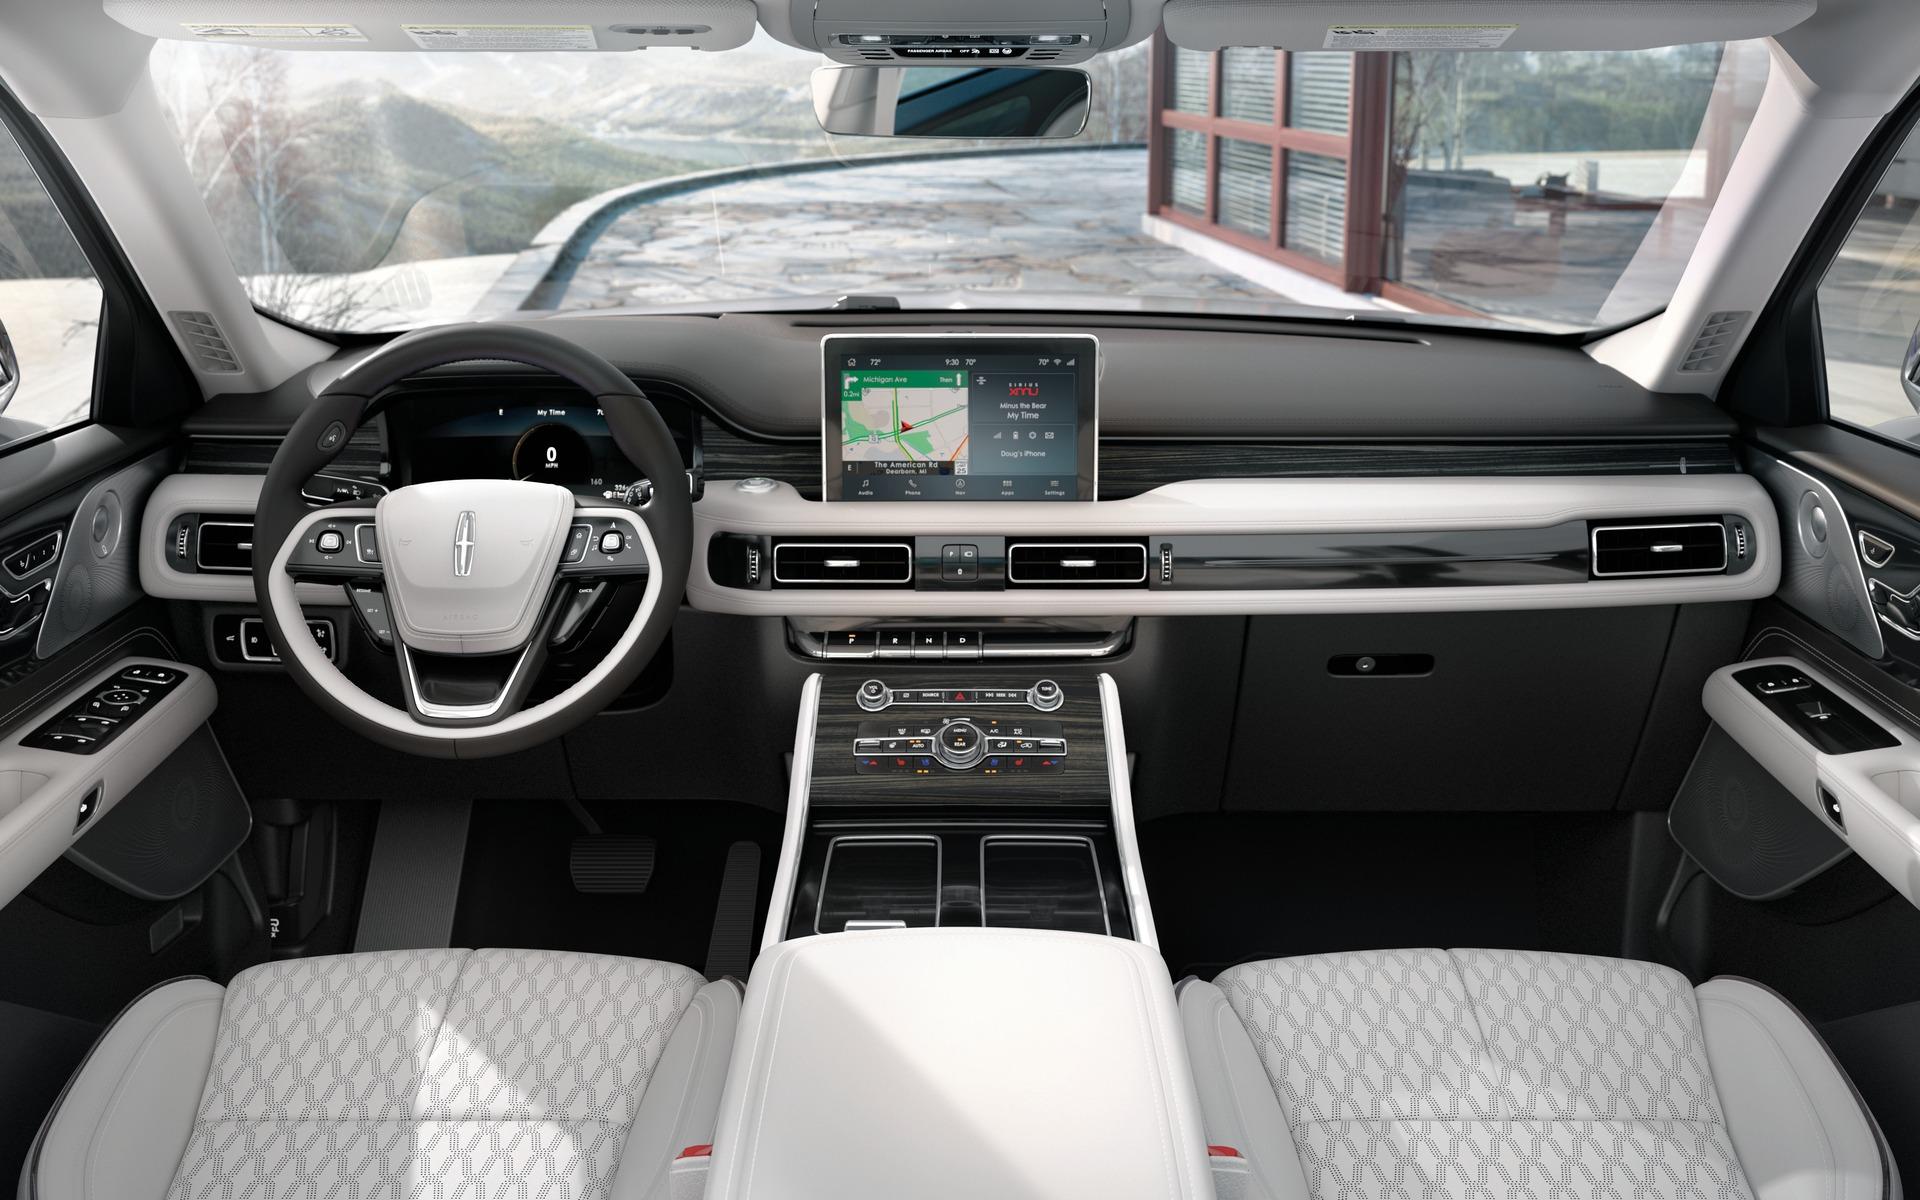 2020 Lincoln Aviator: A Grand Return - The Car Guide